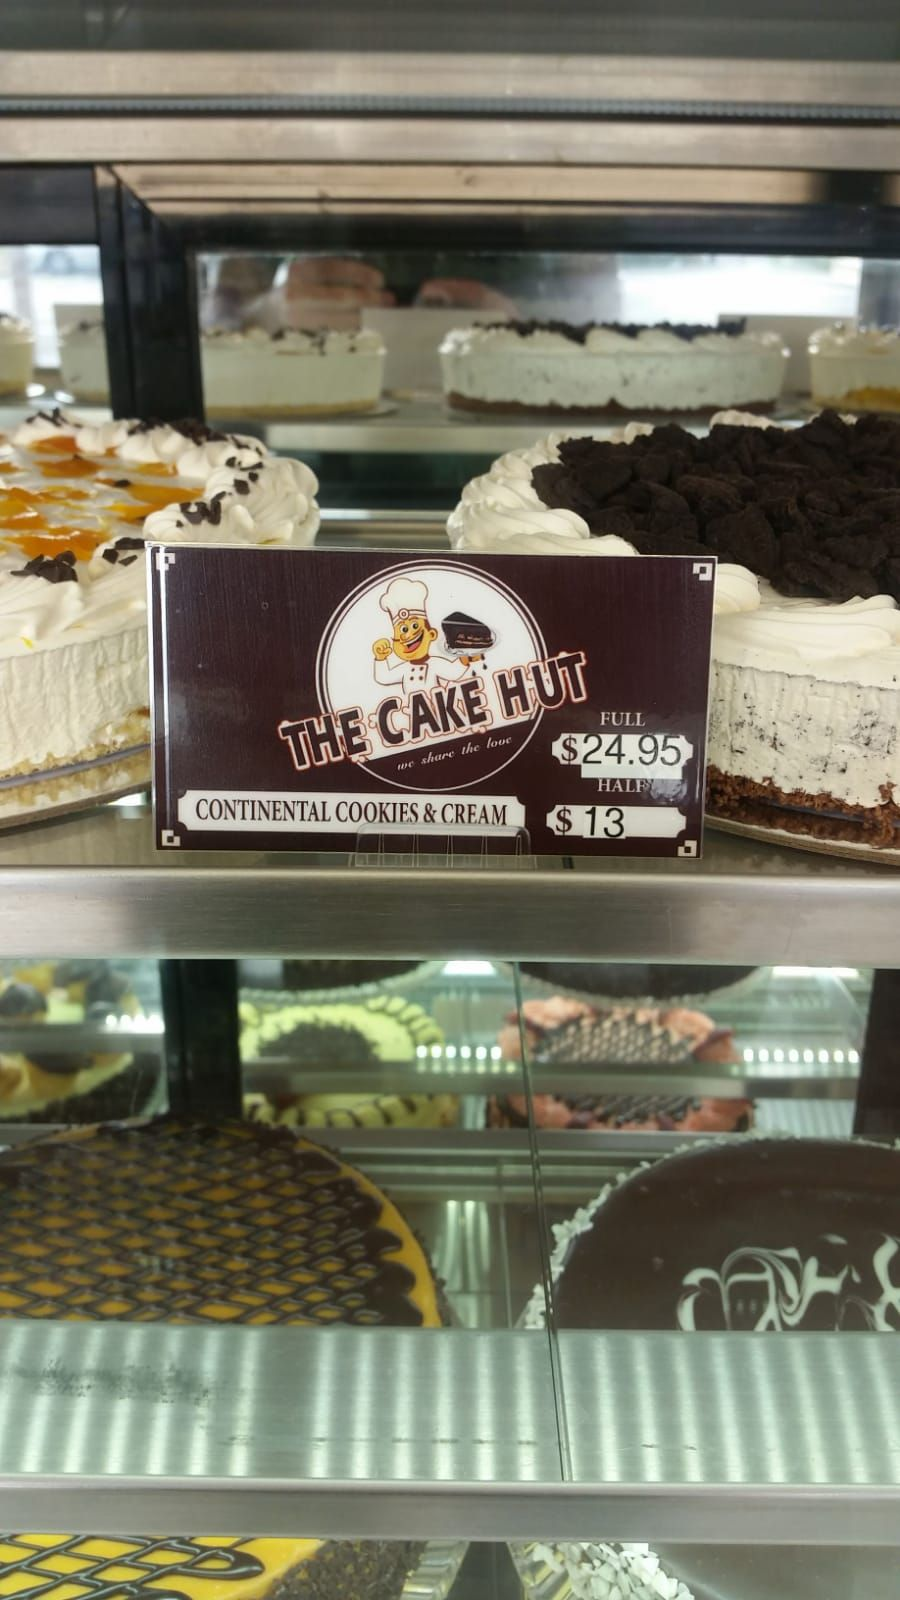 Continental cookies cream cake shop near me cake hut